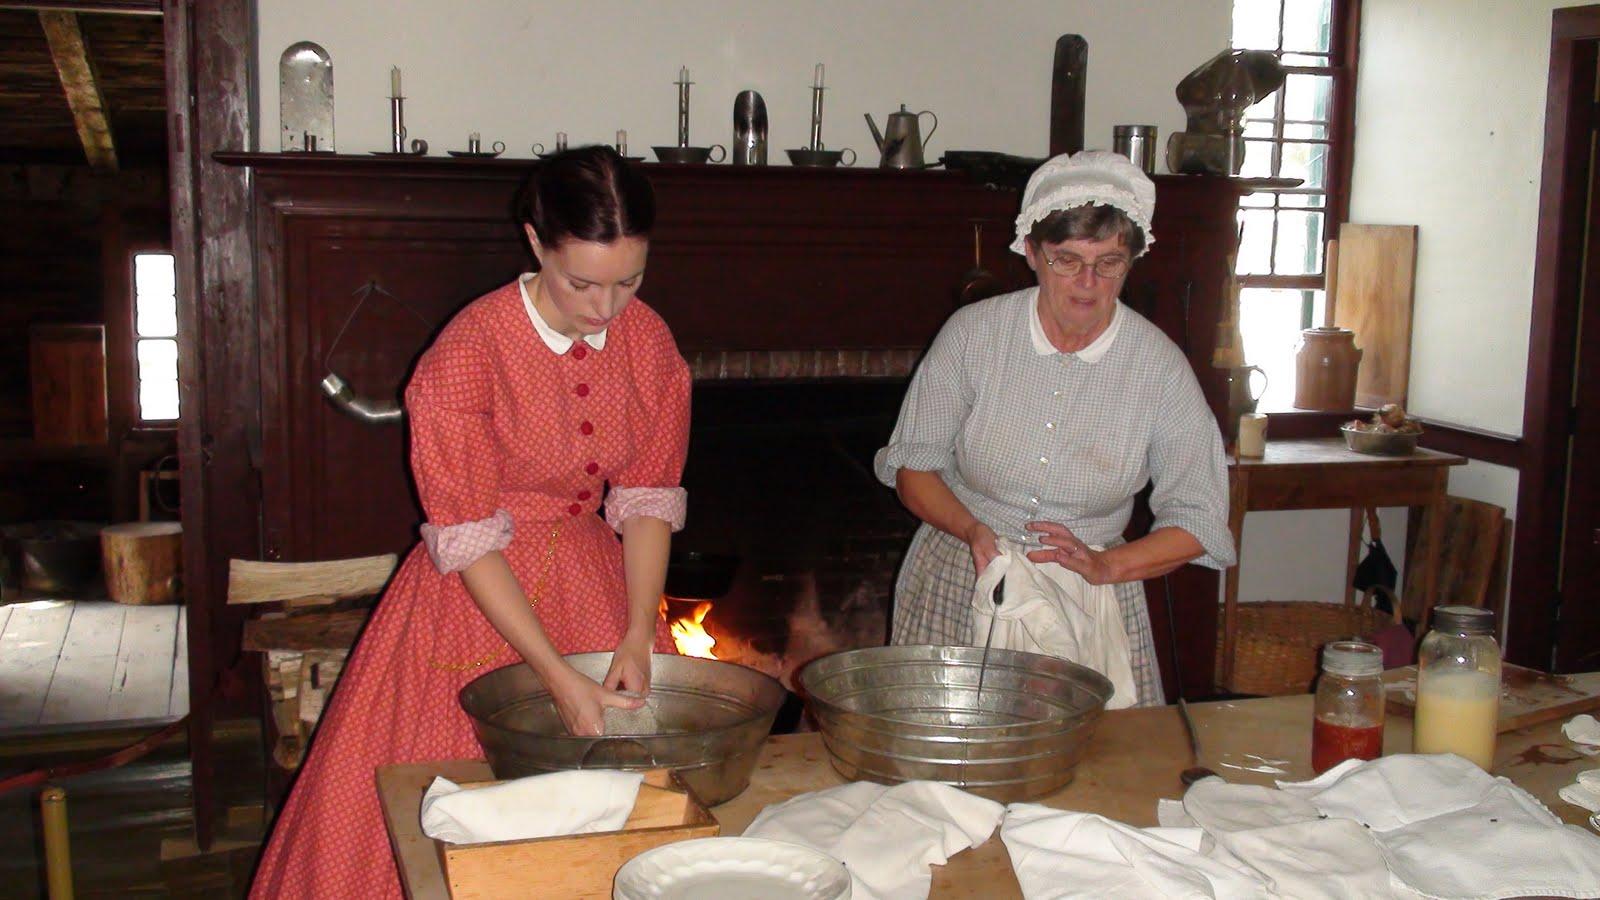 Women making bread at Upper Canada Village